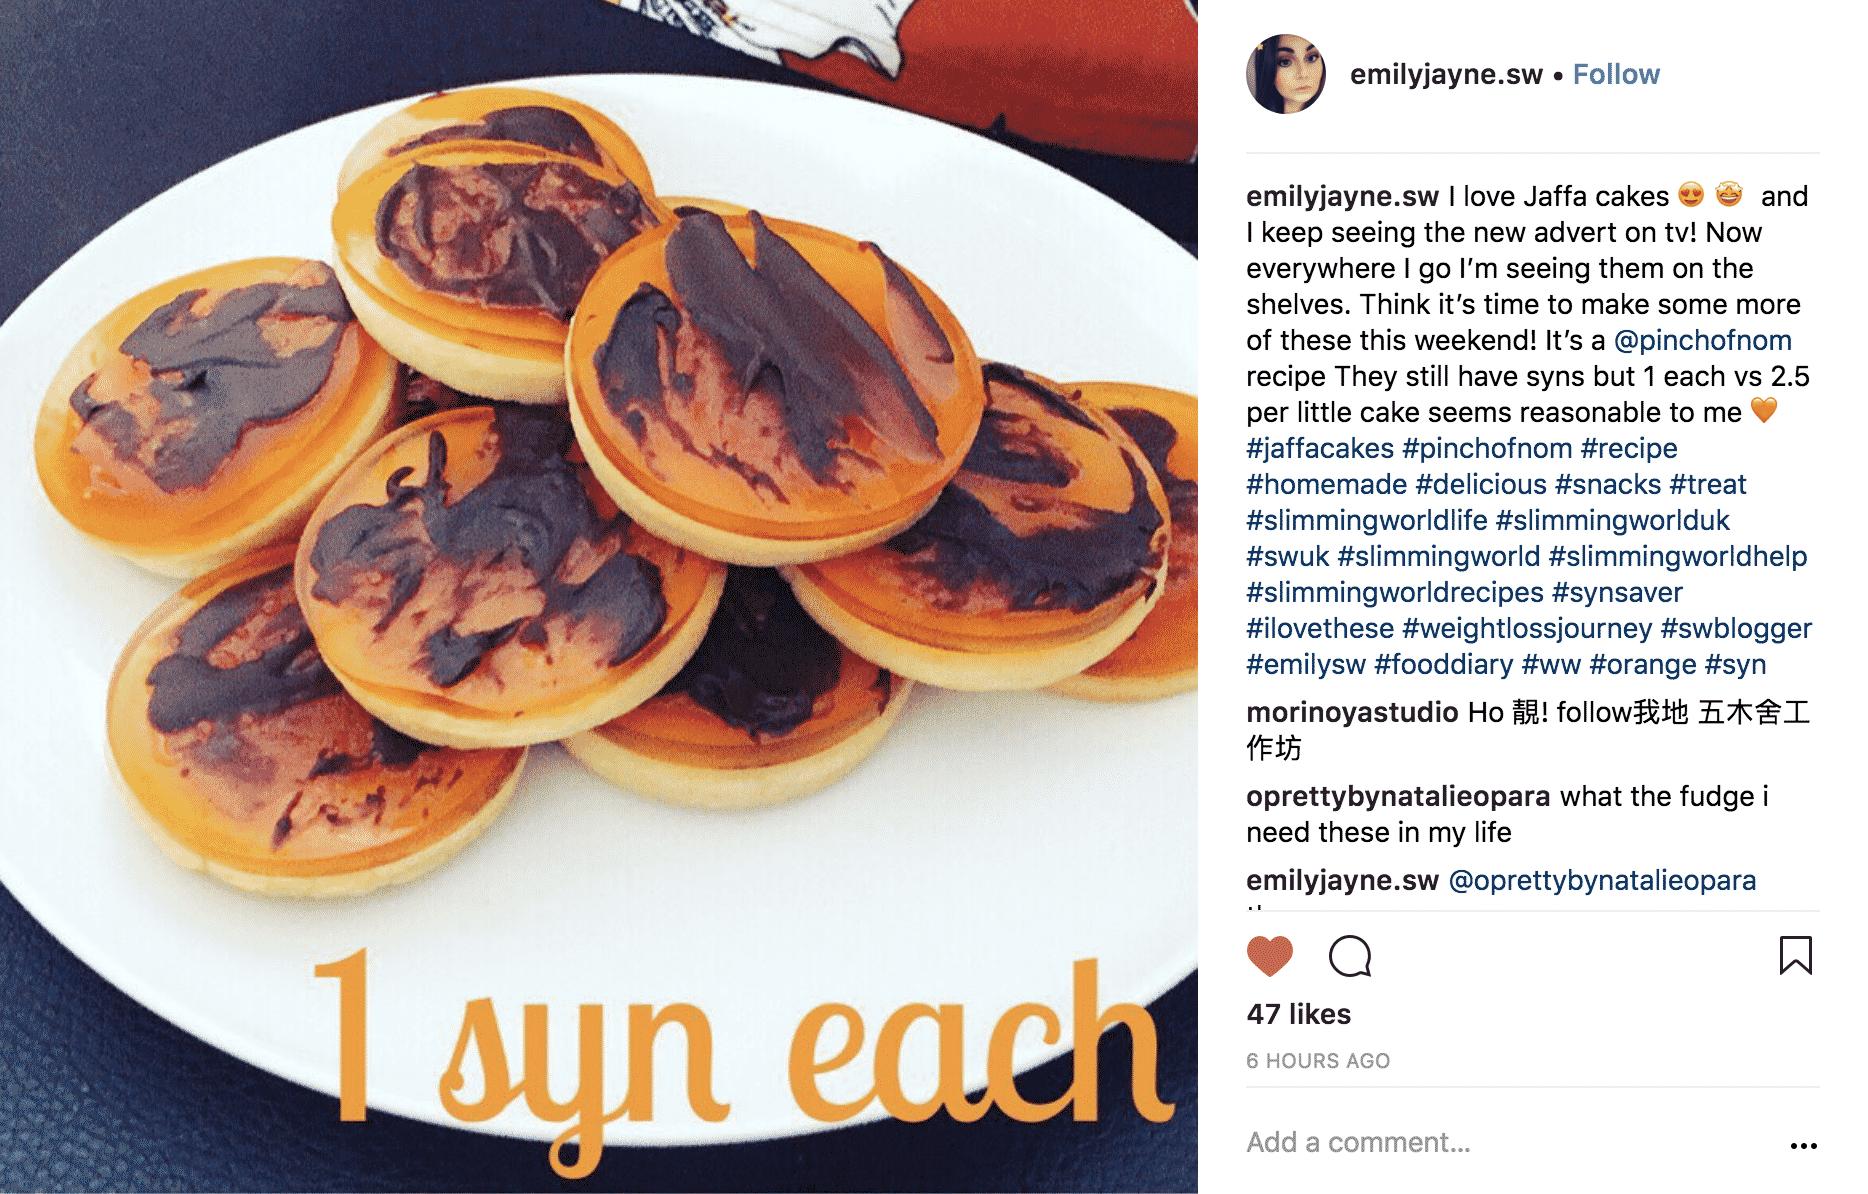 raffa cakes-emilyjayne.sw